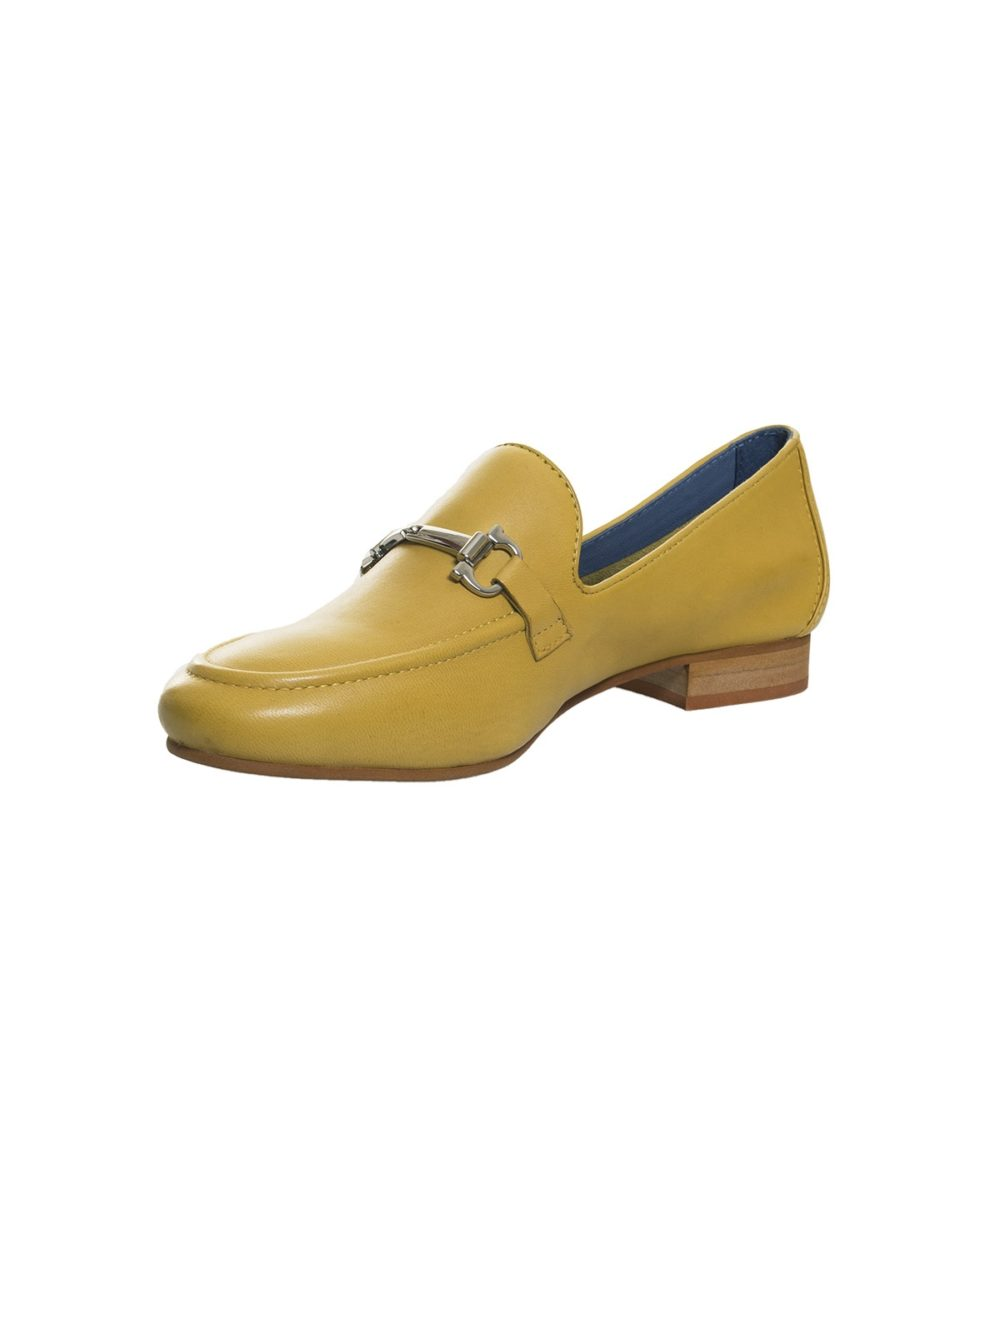 Glady Shoe Regarde le Ciel Katie Kerr Women's Clothing